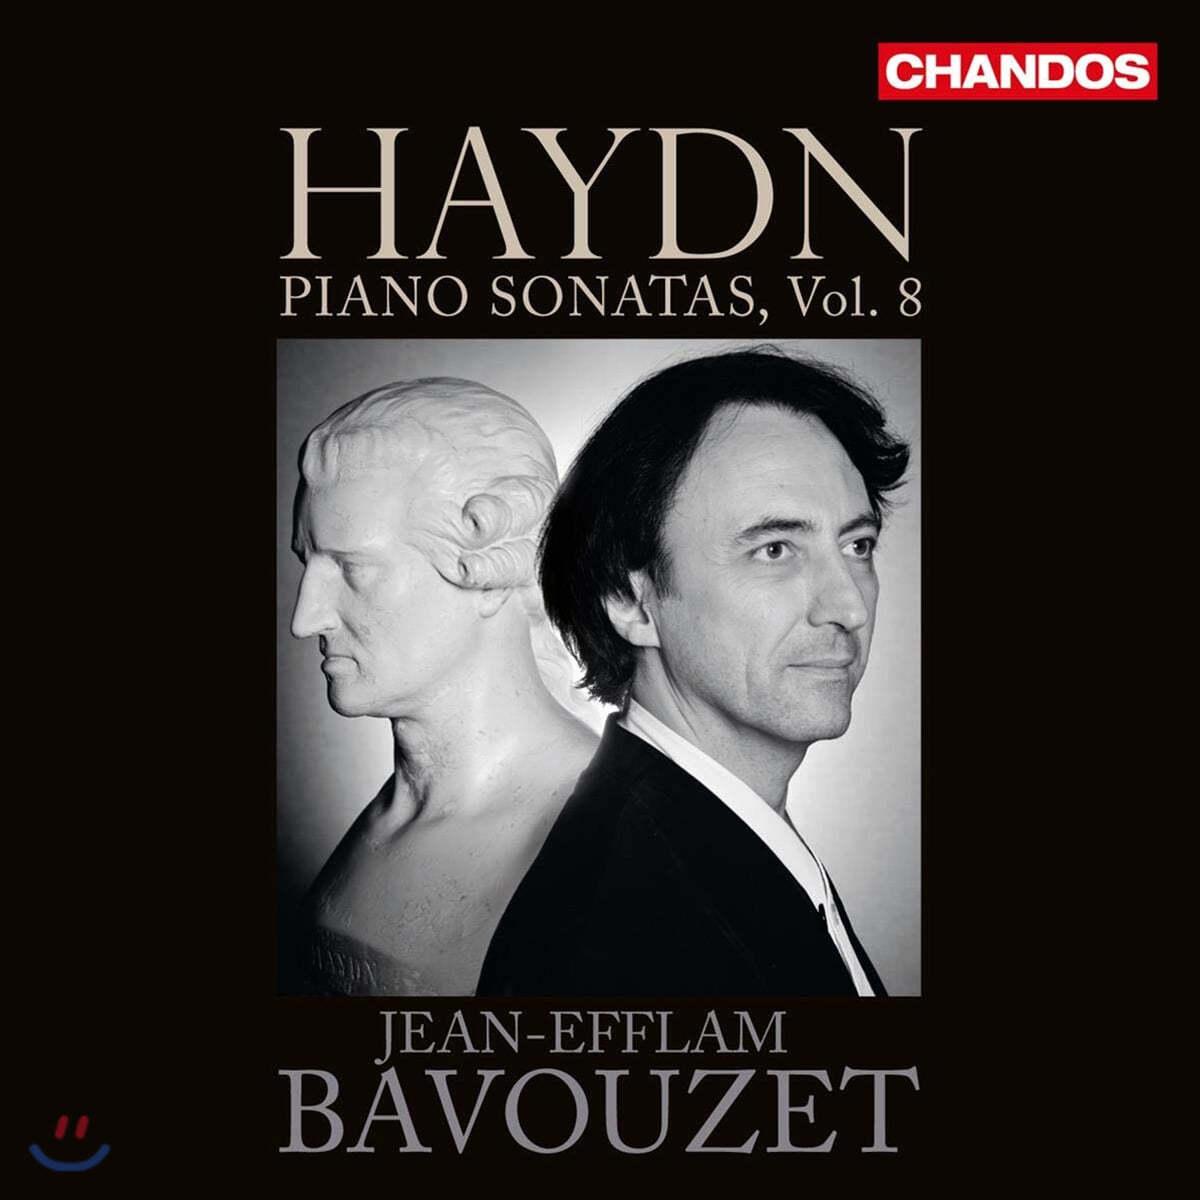 Jean-Efflam Bavouzet 하이든: 피아노 소나타 8집 - 장-에플람 바부제